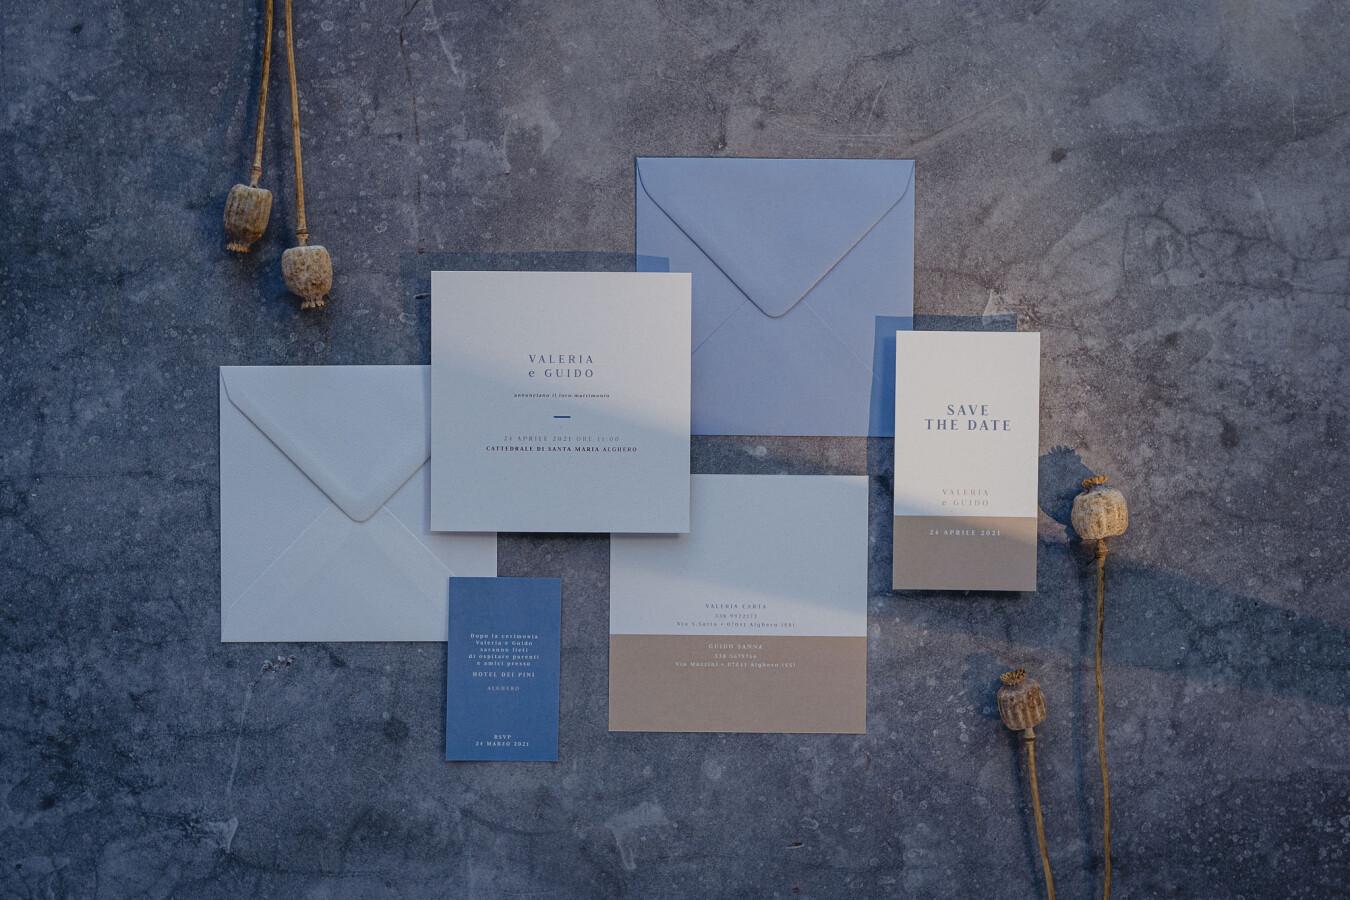 Partecipazioni nozze MINIMAL - Wedsign